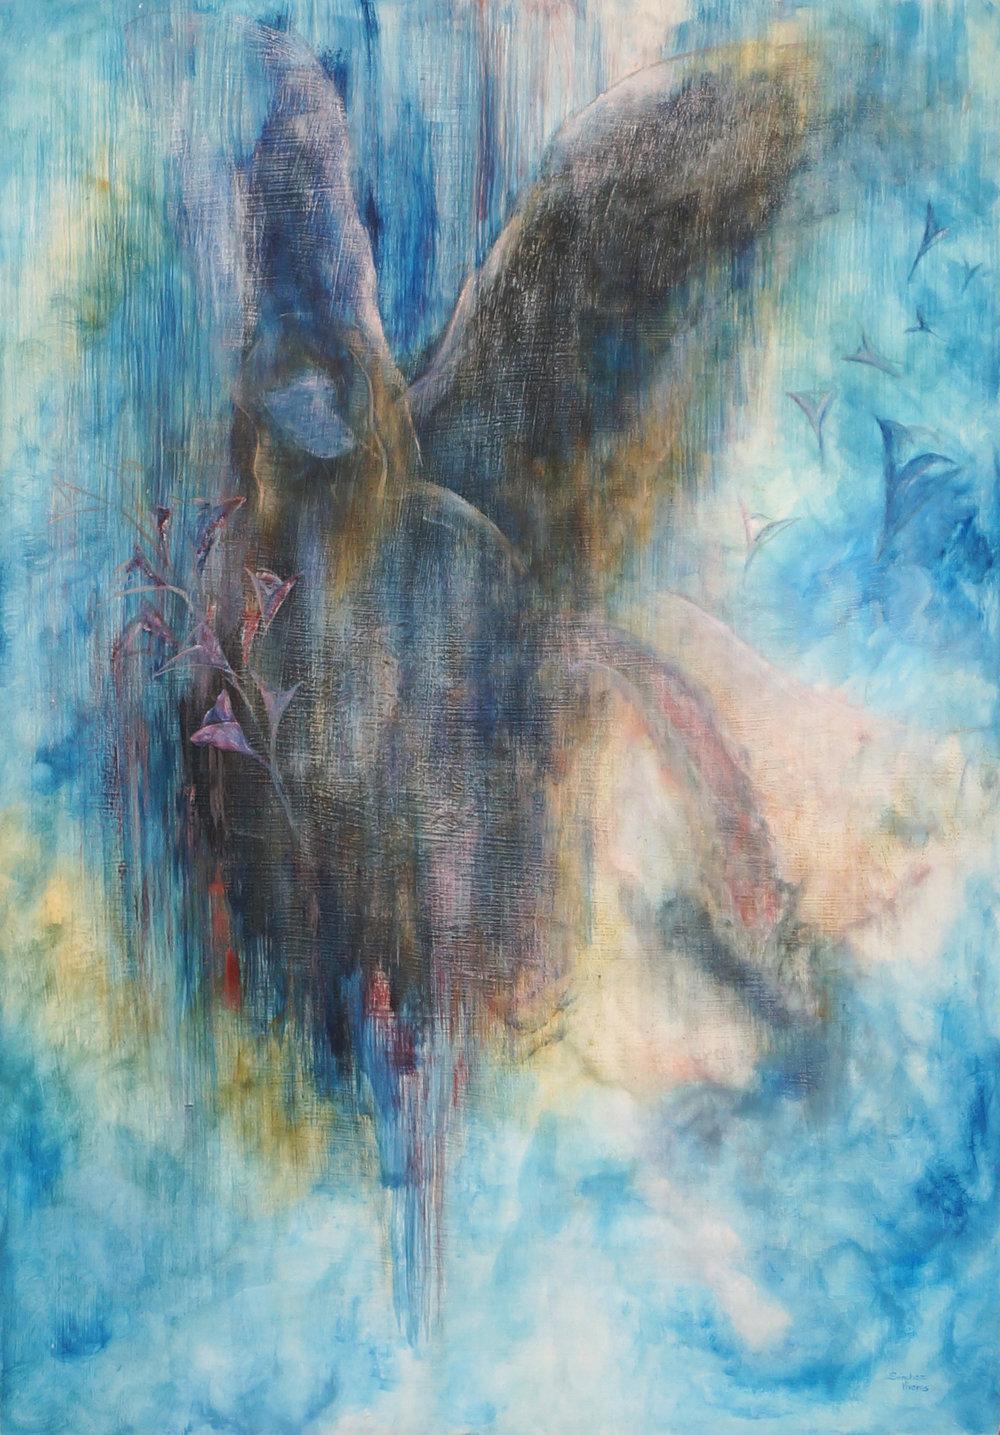 Arcangel Gabriel, 2009  Técnica mixta: acrílico y óleo sobre triplay  122 x 86 cm